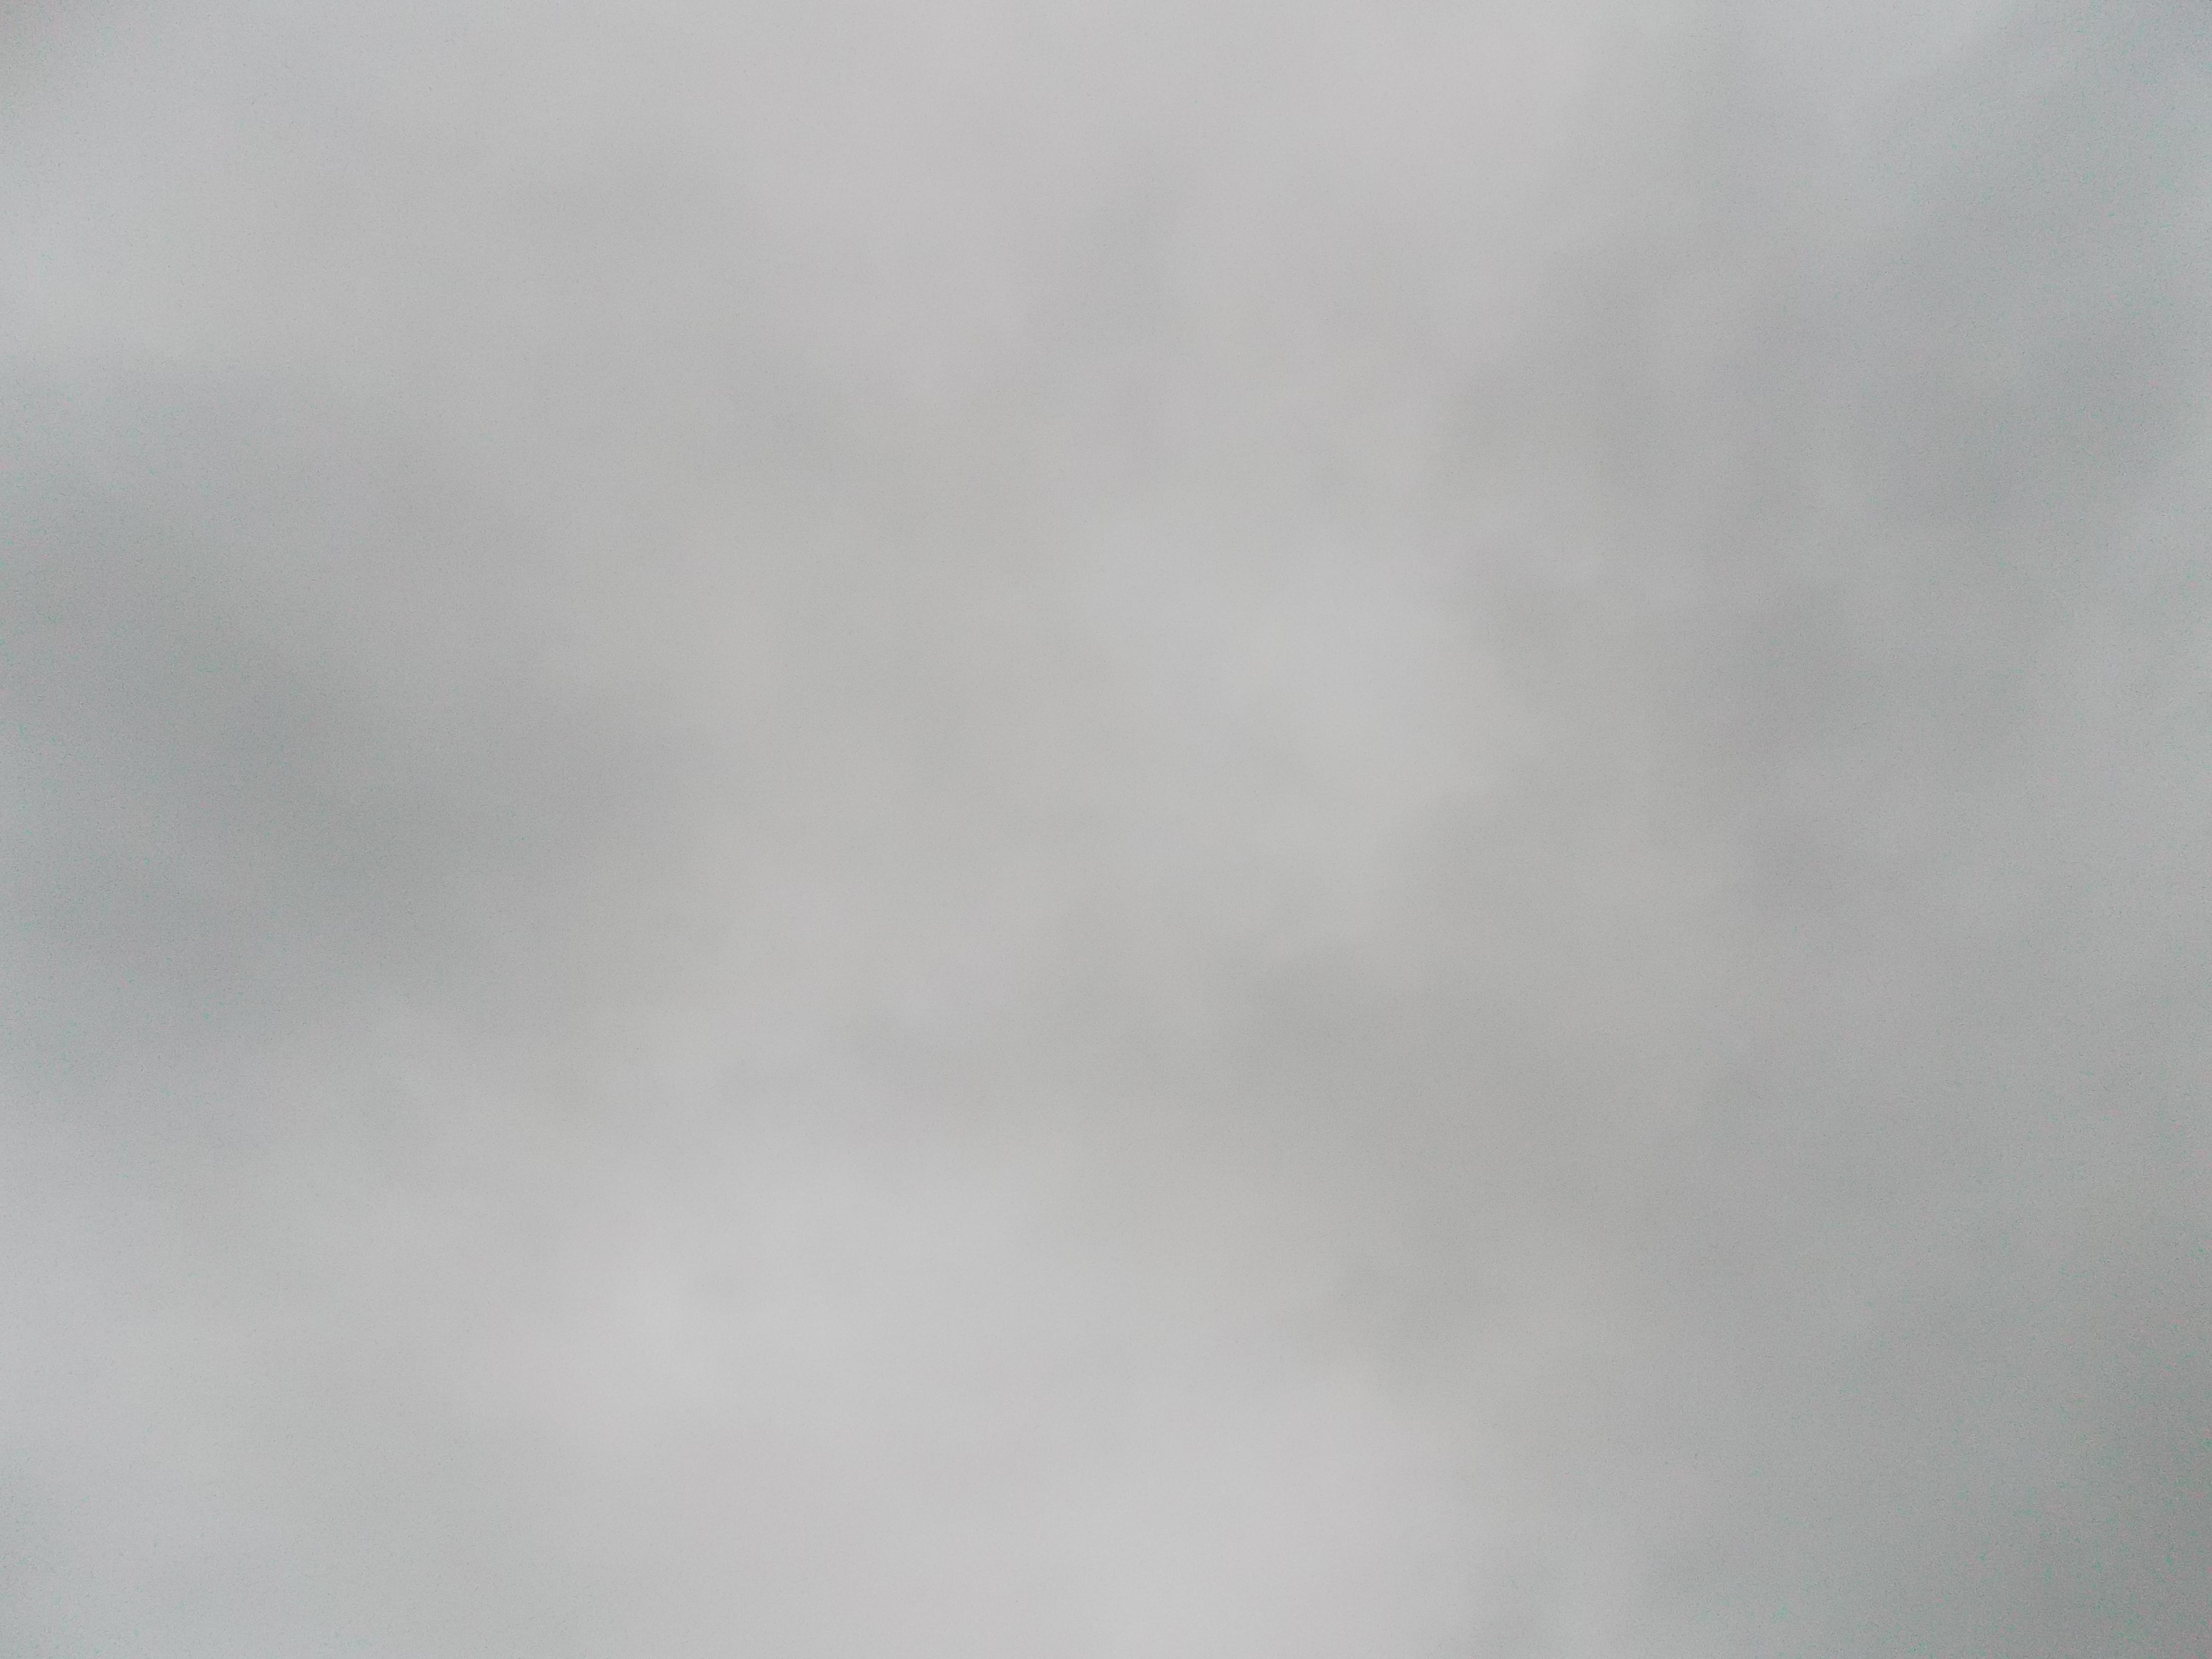 2013-05-30 Longitude -0.371 Latitude 49.182 Altitude 29 Heure 20h27